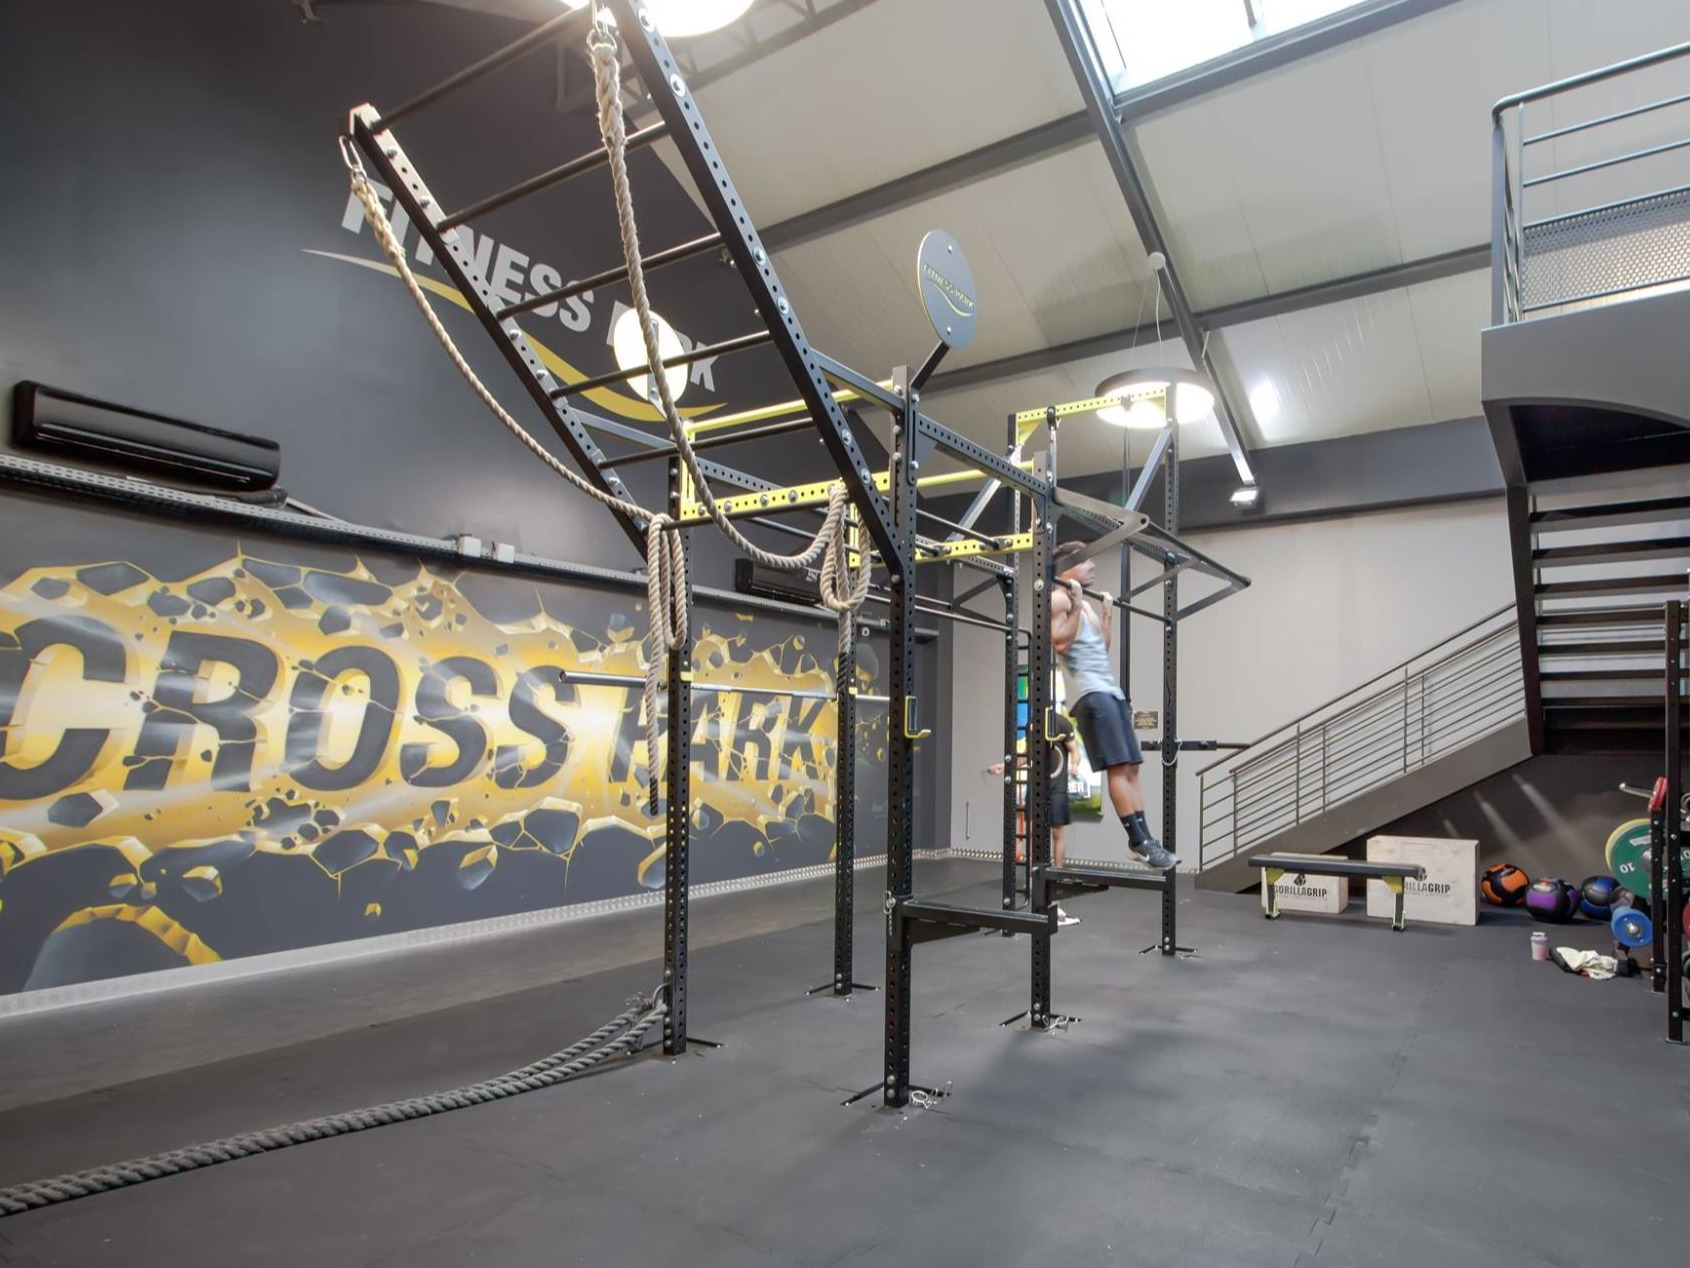 Fitness Park Issy les Moulineaux